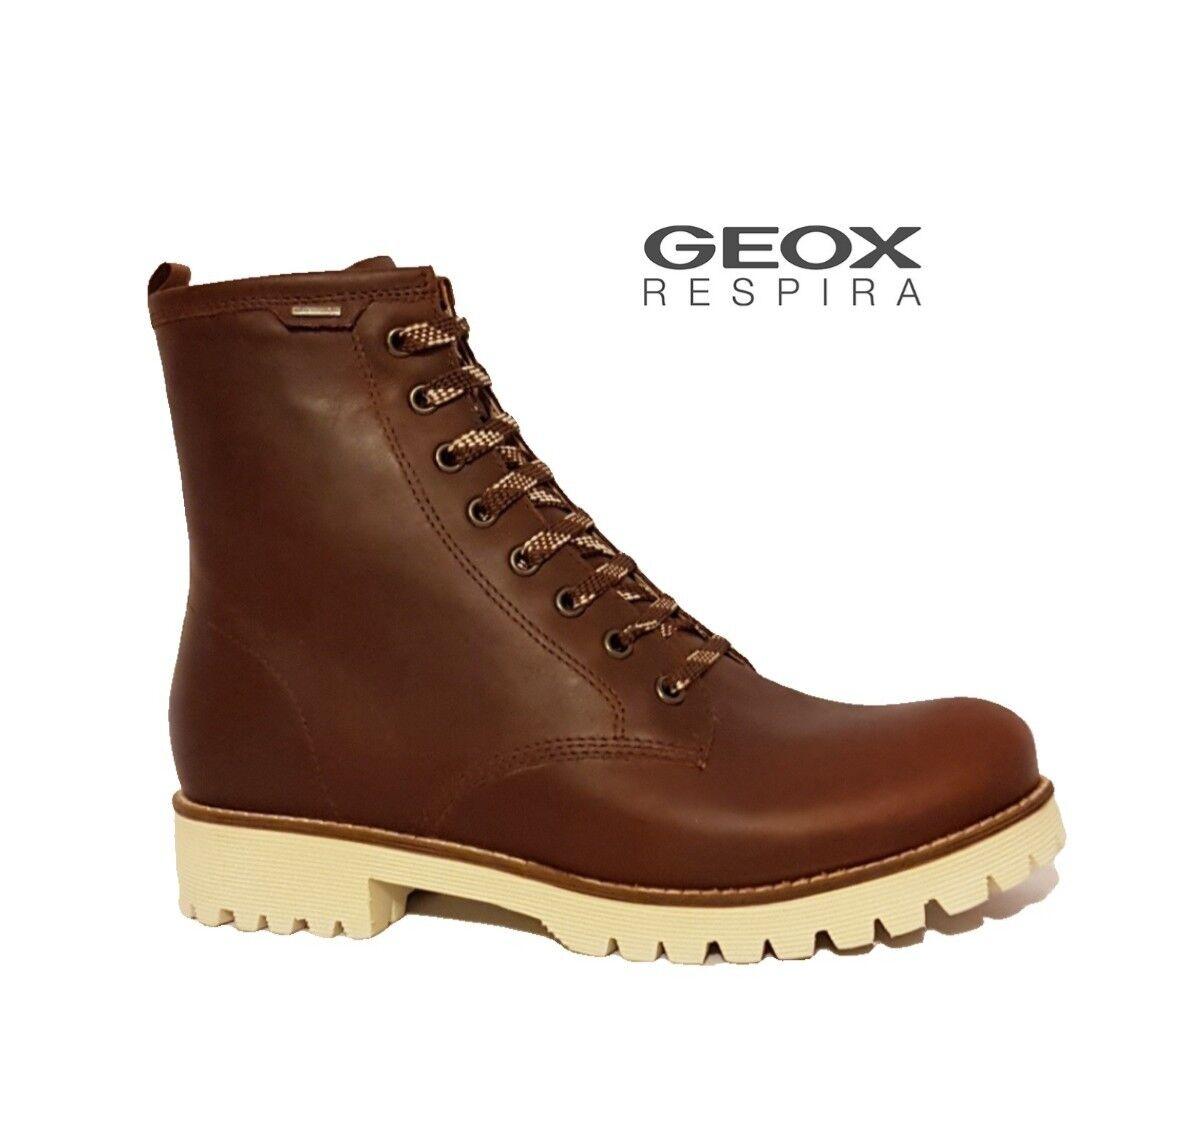 GEOX AMPHIBOX RESIRA WALKING BOOTS  WAXED BROWN LEATHER WATERPROOF LADIES